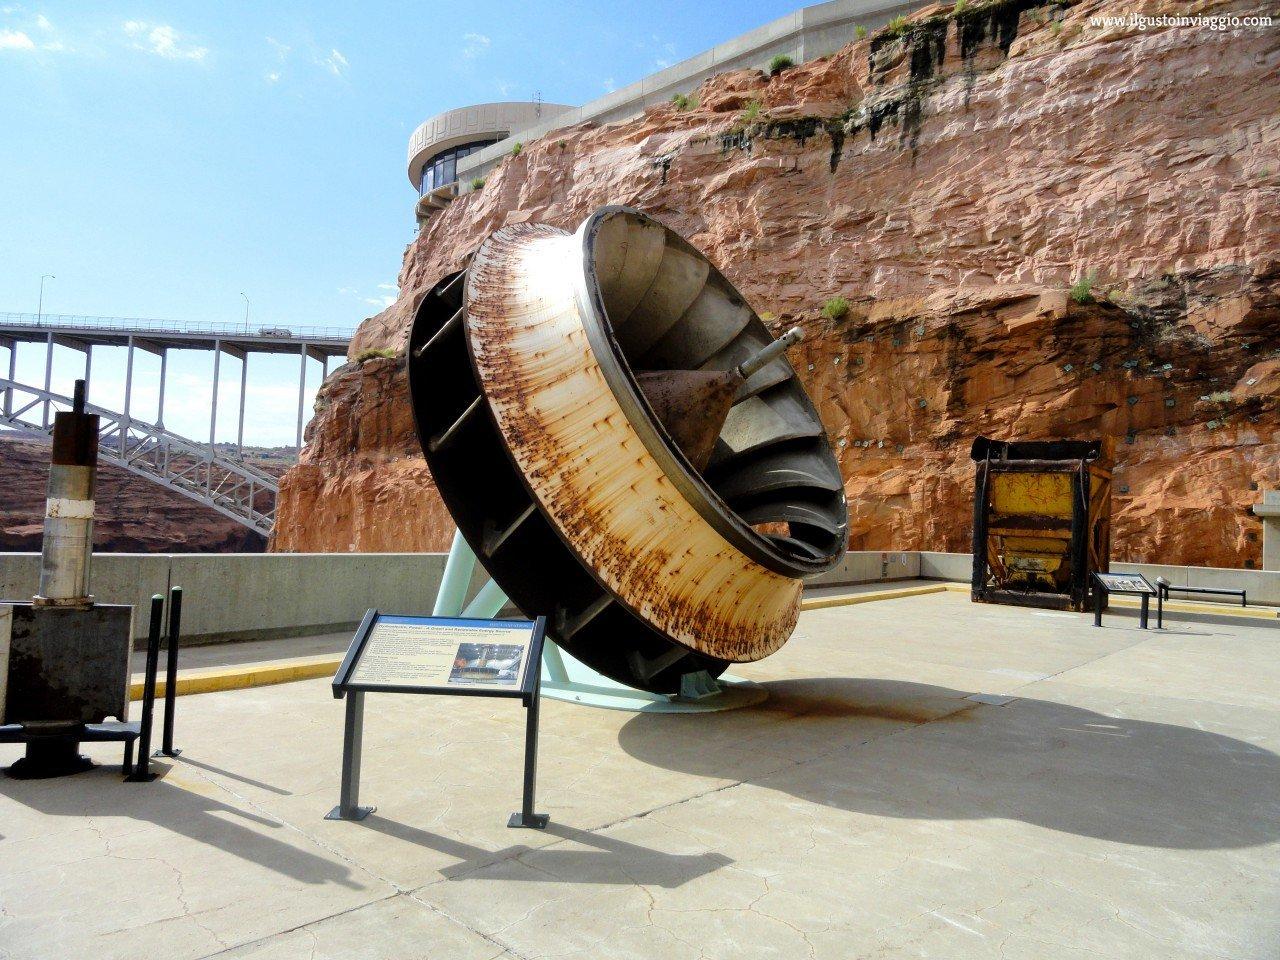 diga del glen canyon, glen canyon dam, turbina centrale idroelettrica